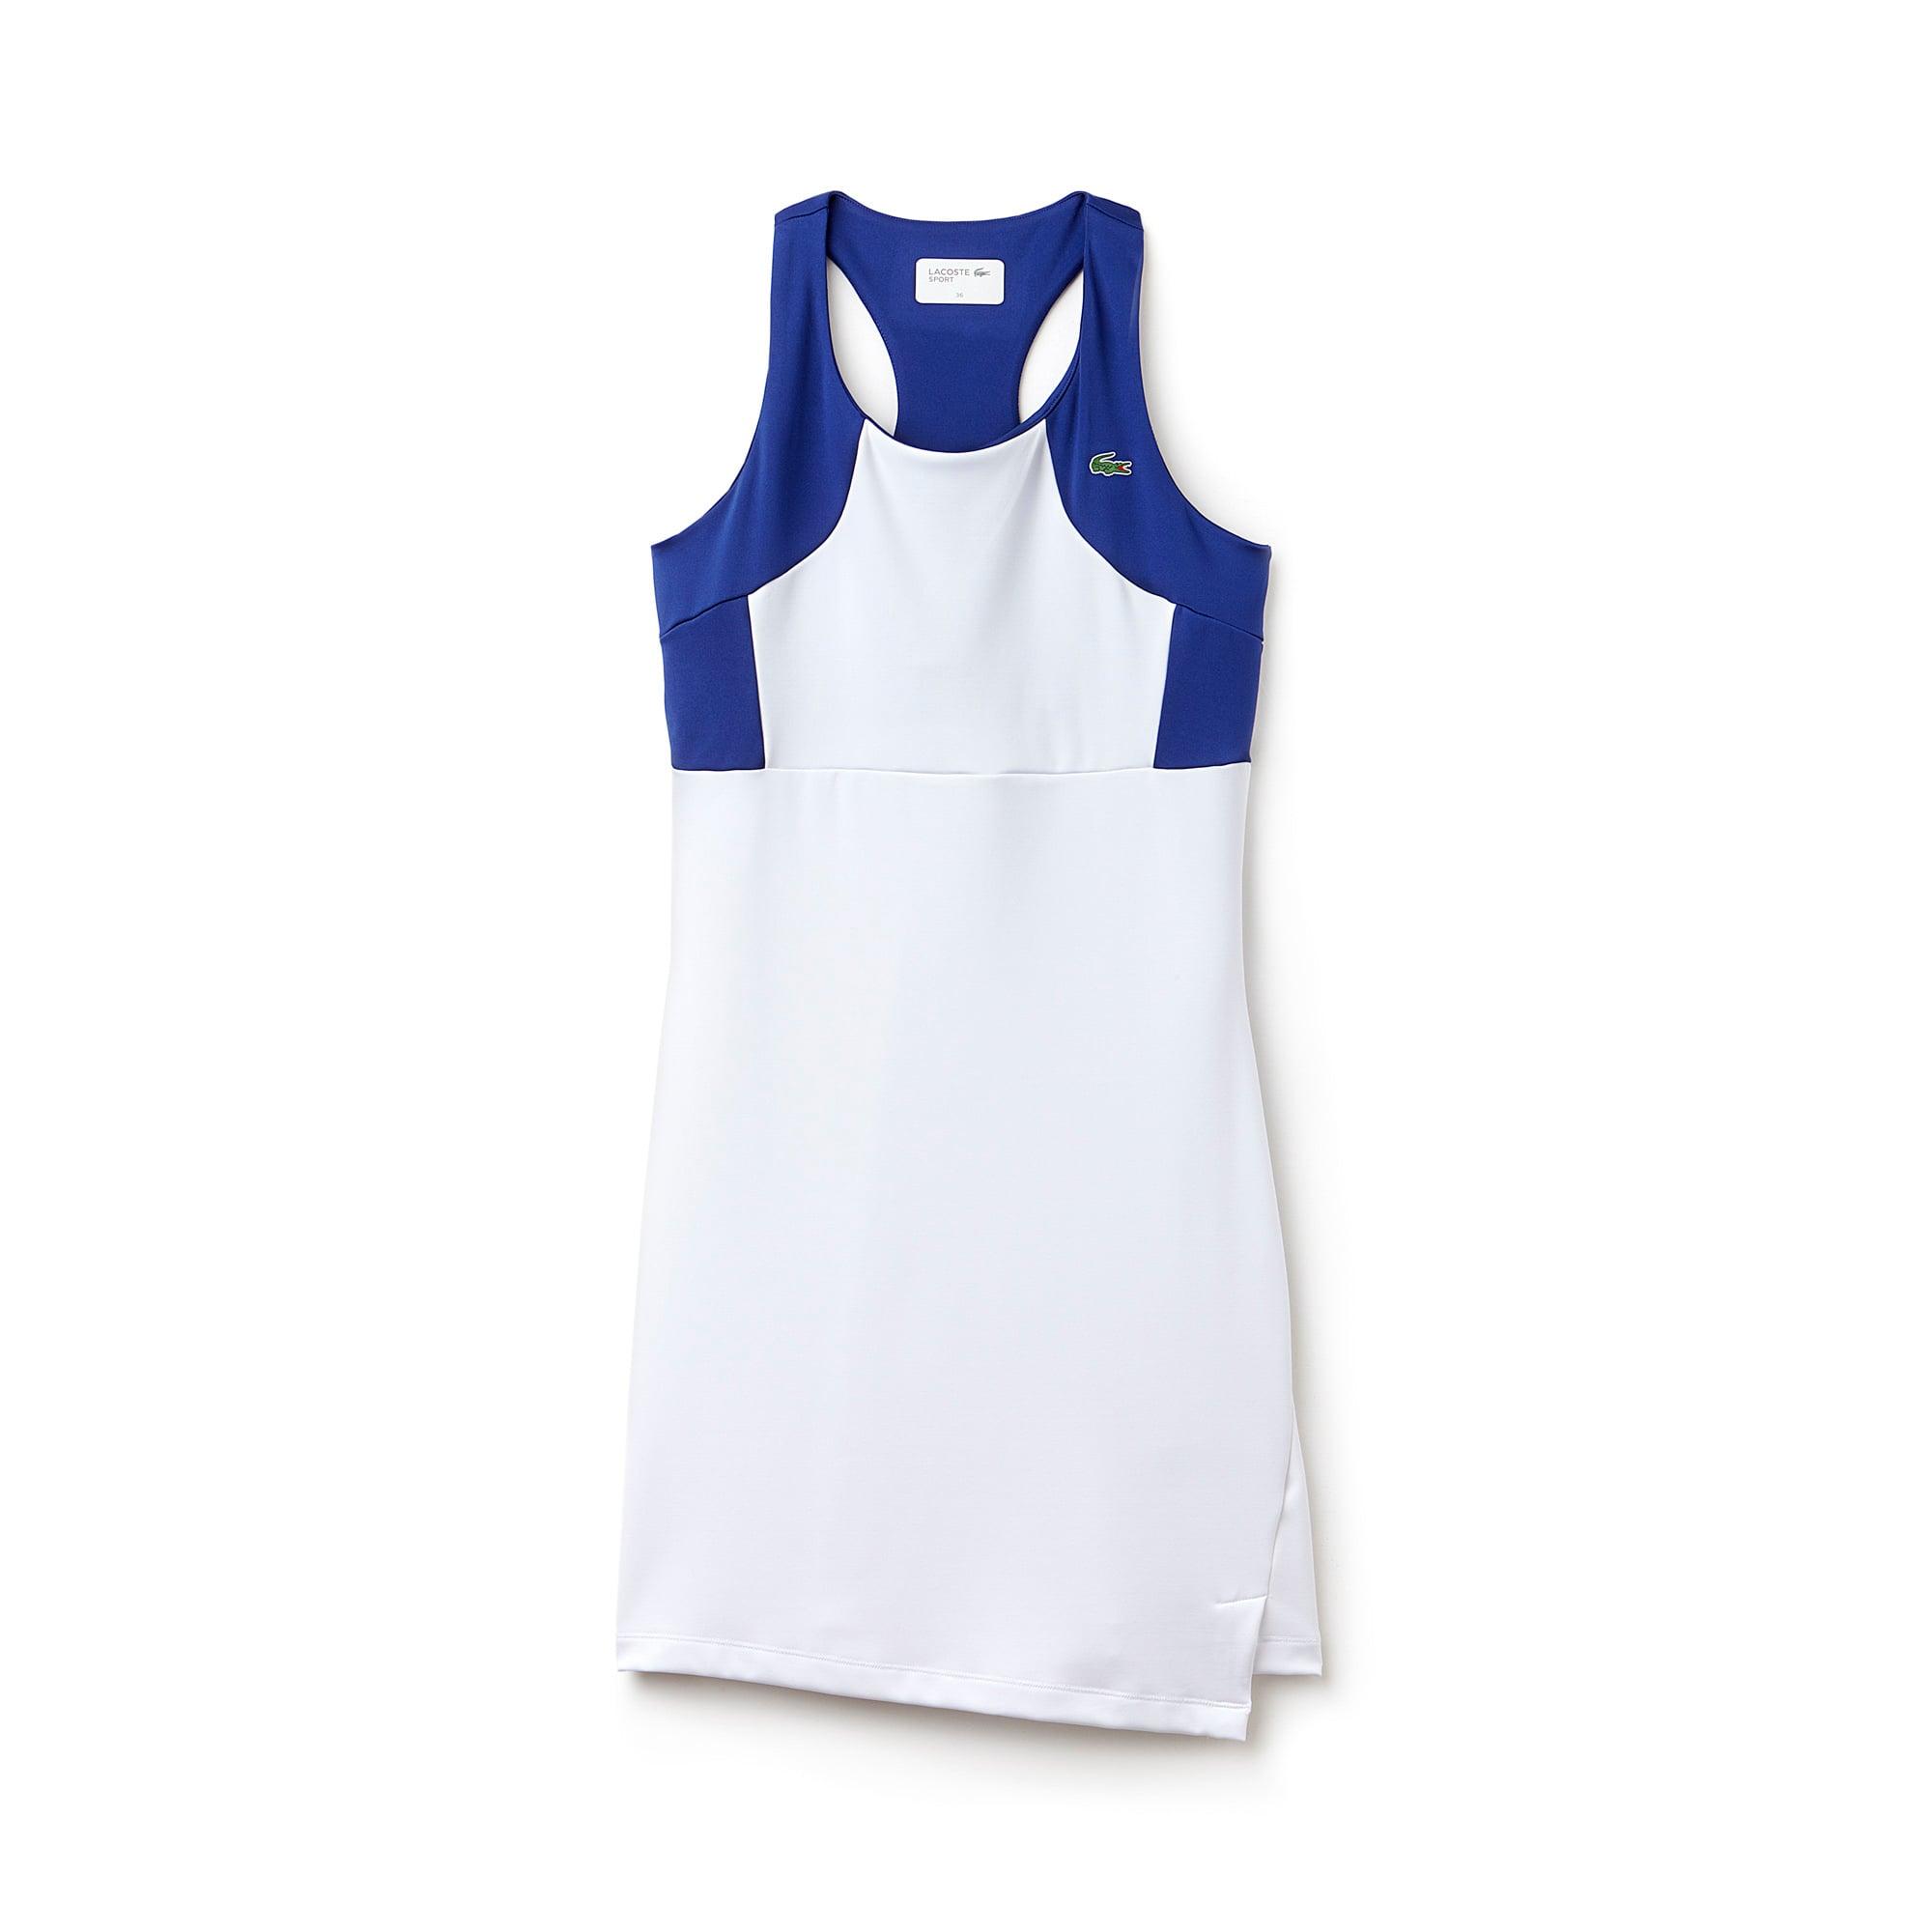 Women's  SPORT Tennis Colorblock Jersey Racerback Dress